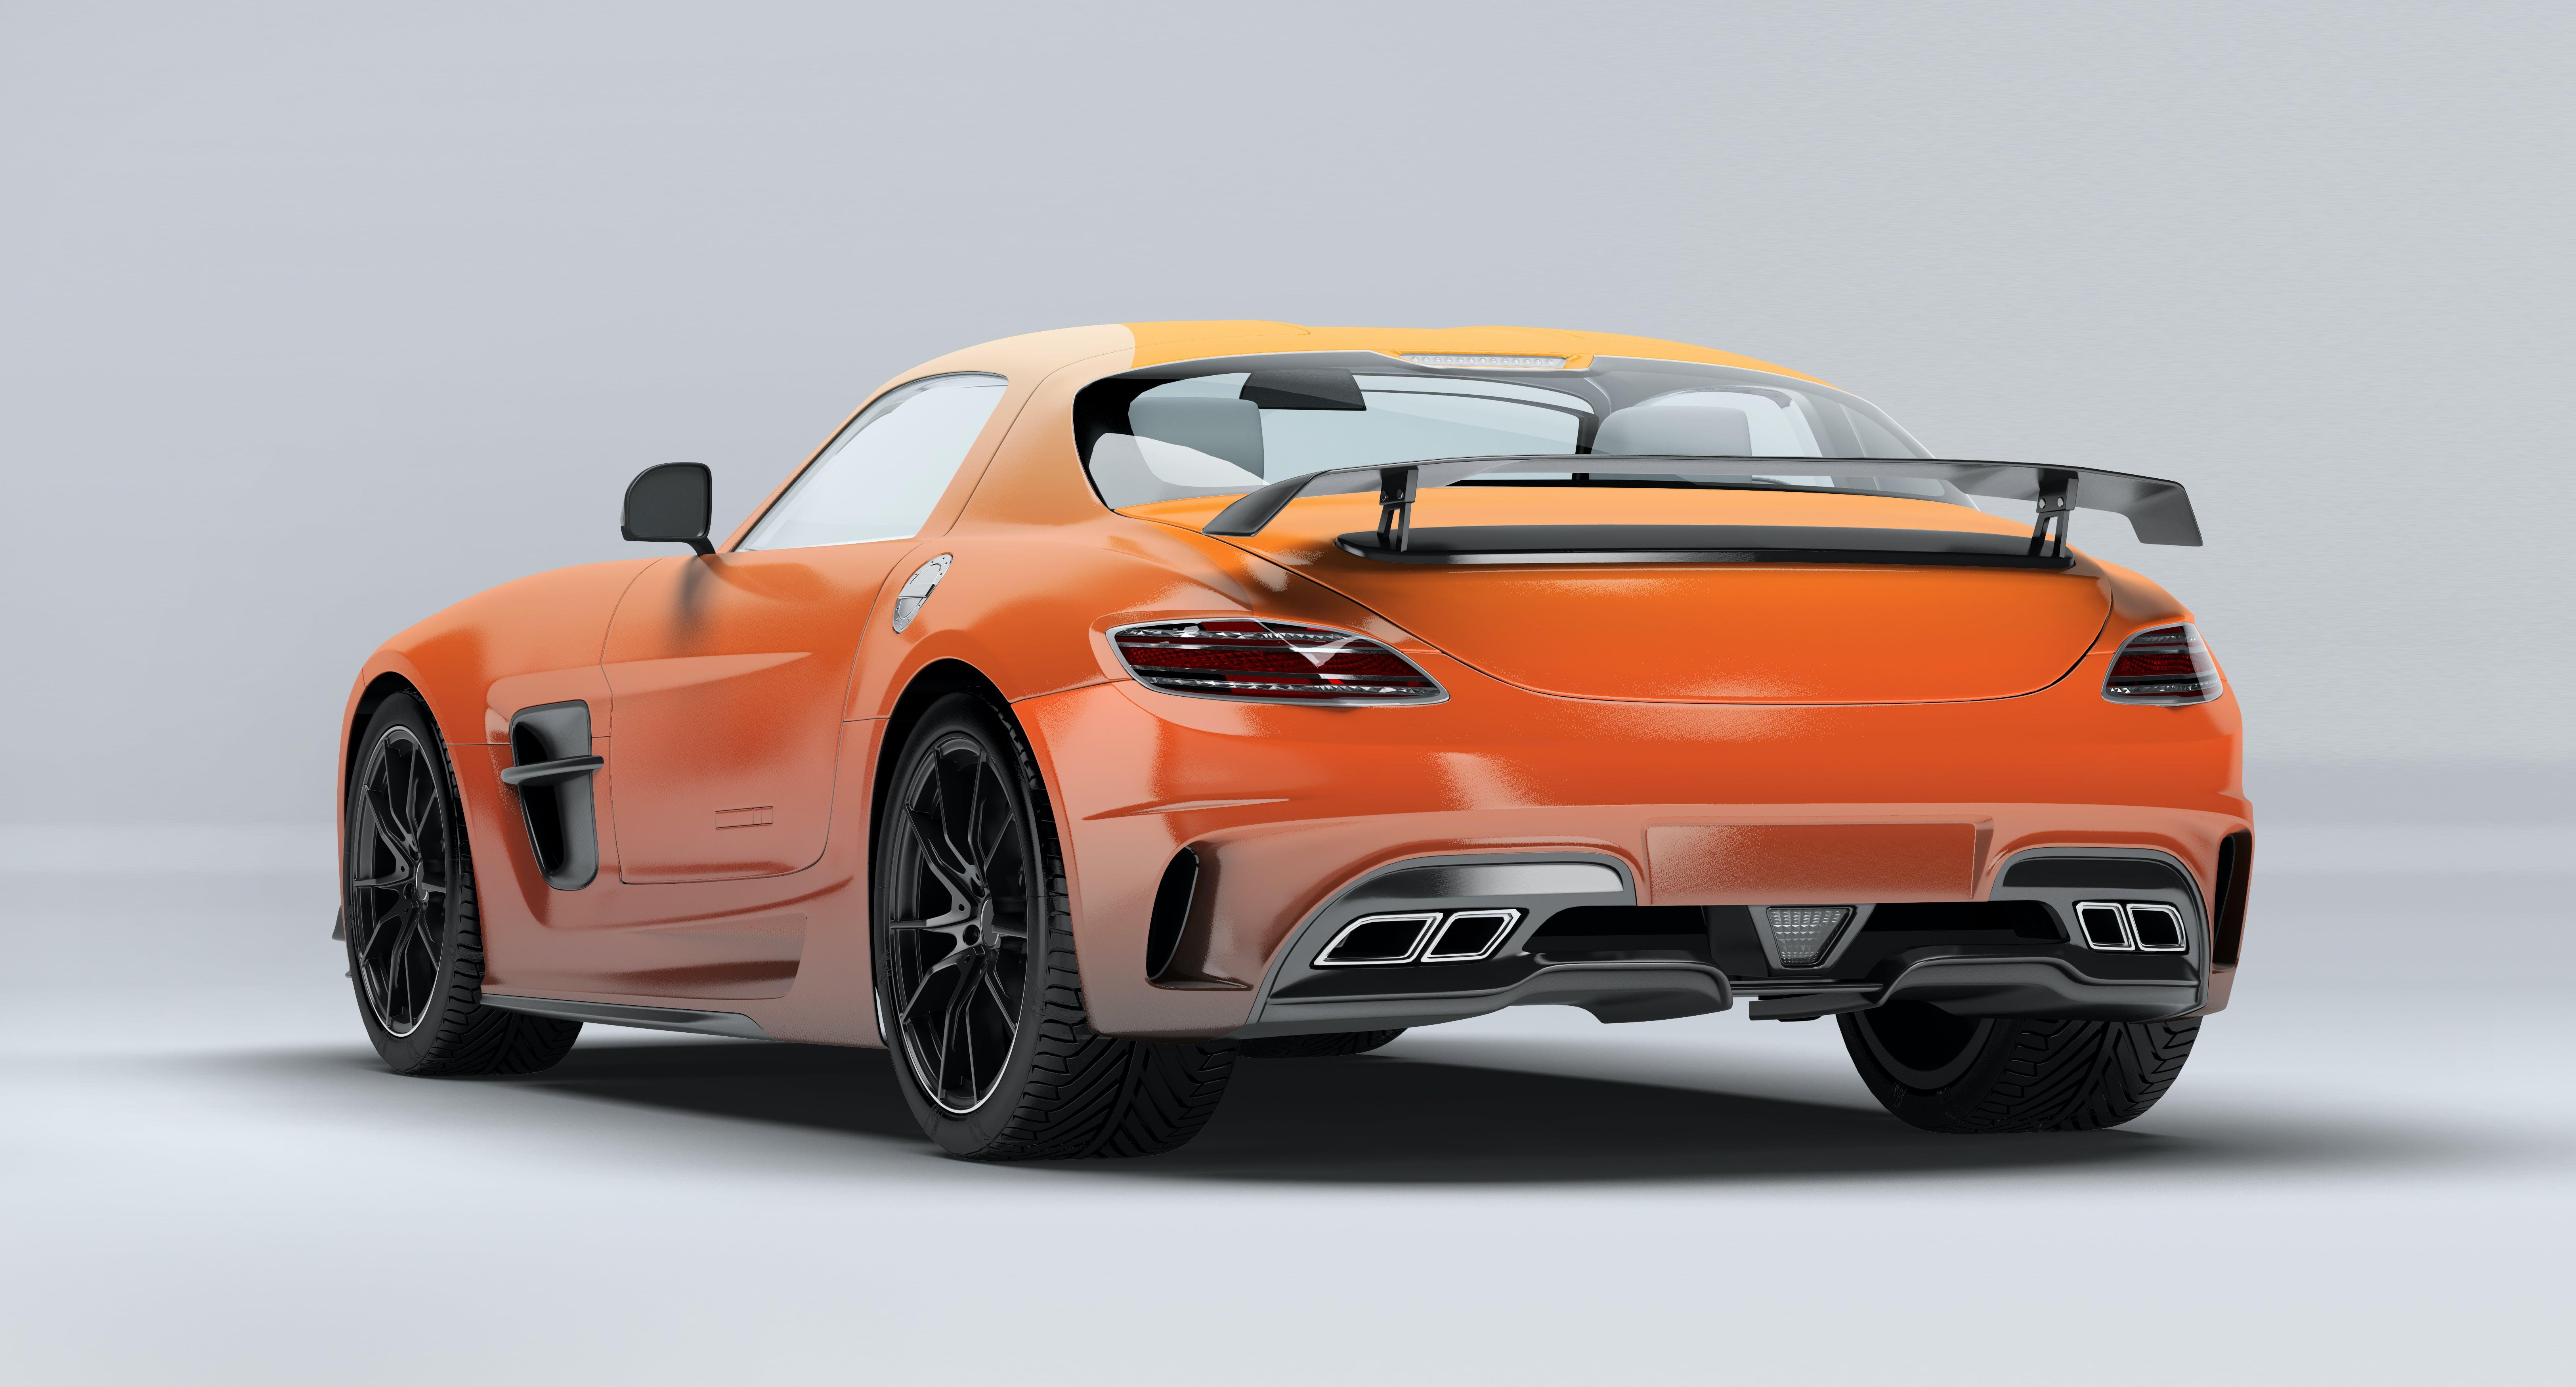 Free stock photo of car, cars, luxury car, Mercedes SLS AMG